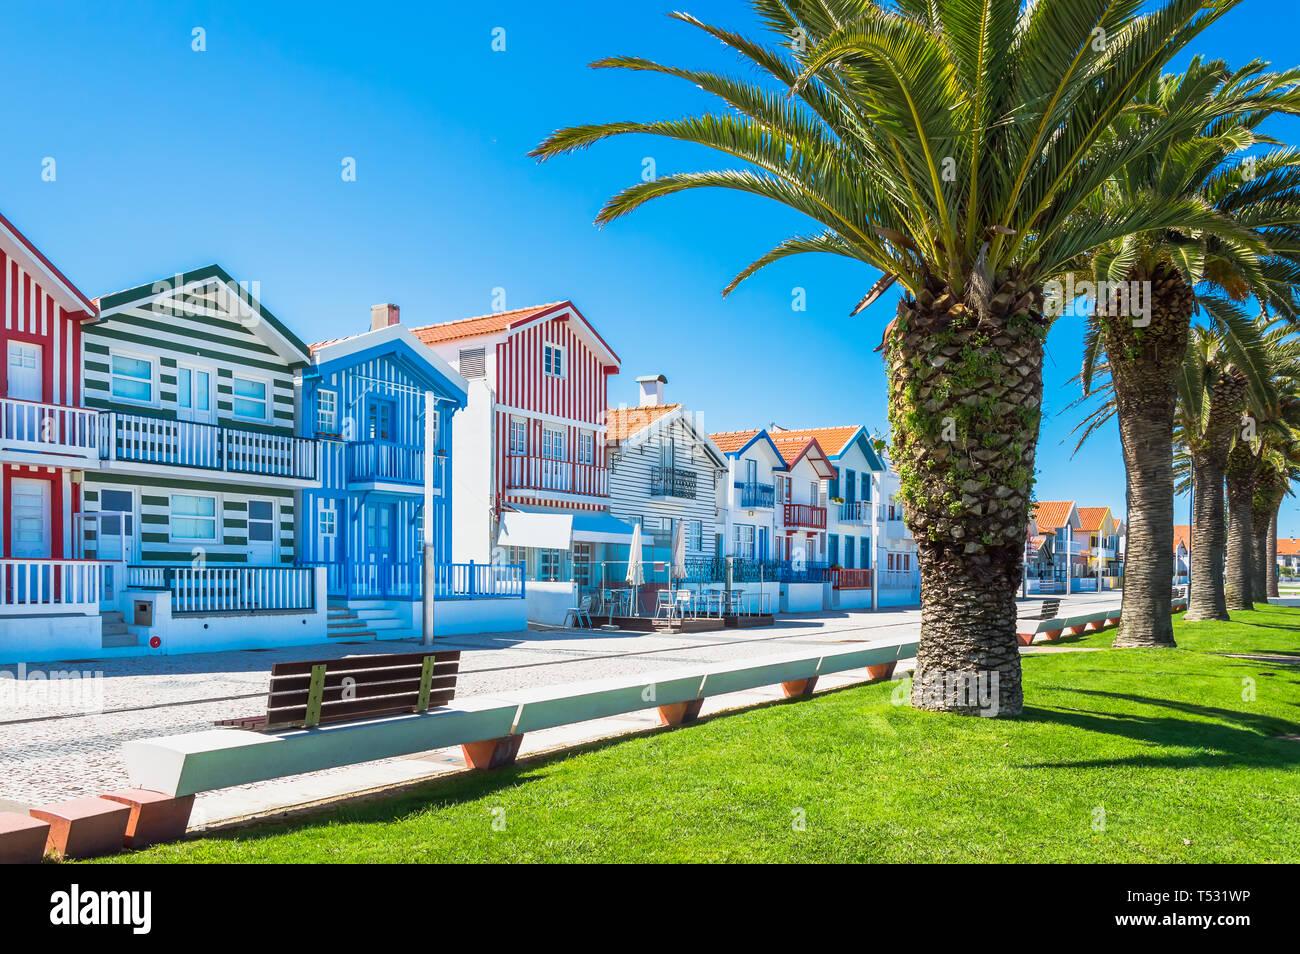 Costa Nova, Portugal: colorful striped houses called Palheiros with red, blue and green stripes. Costa Nova do Prado is a beach village resort on Atla Stock Photo